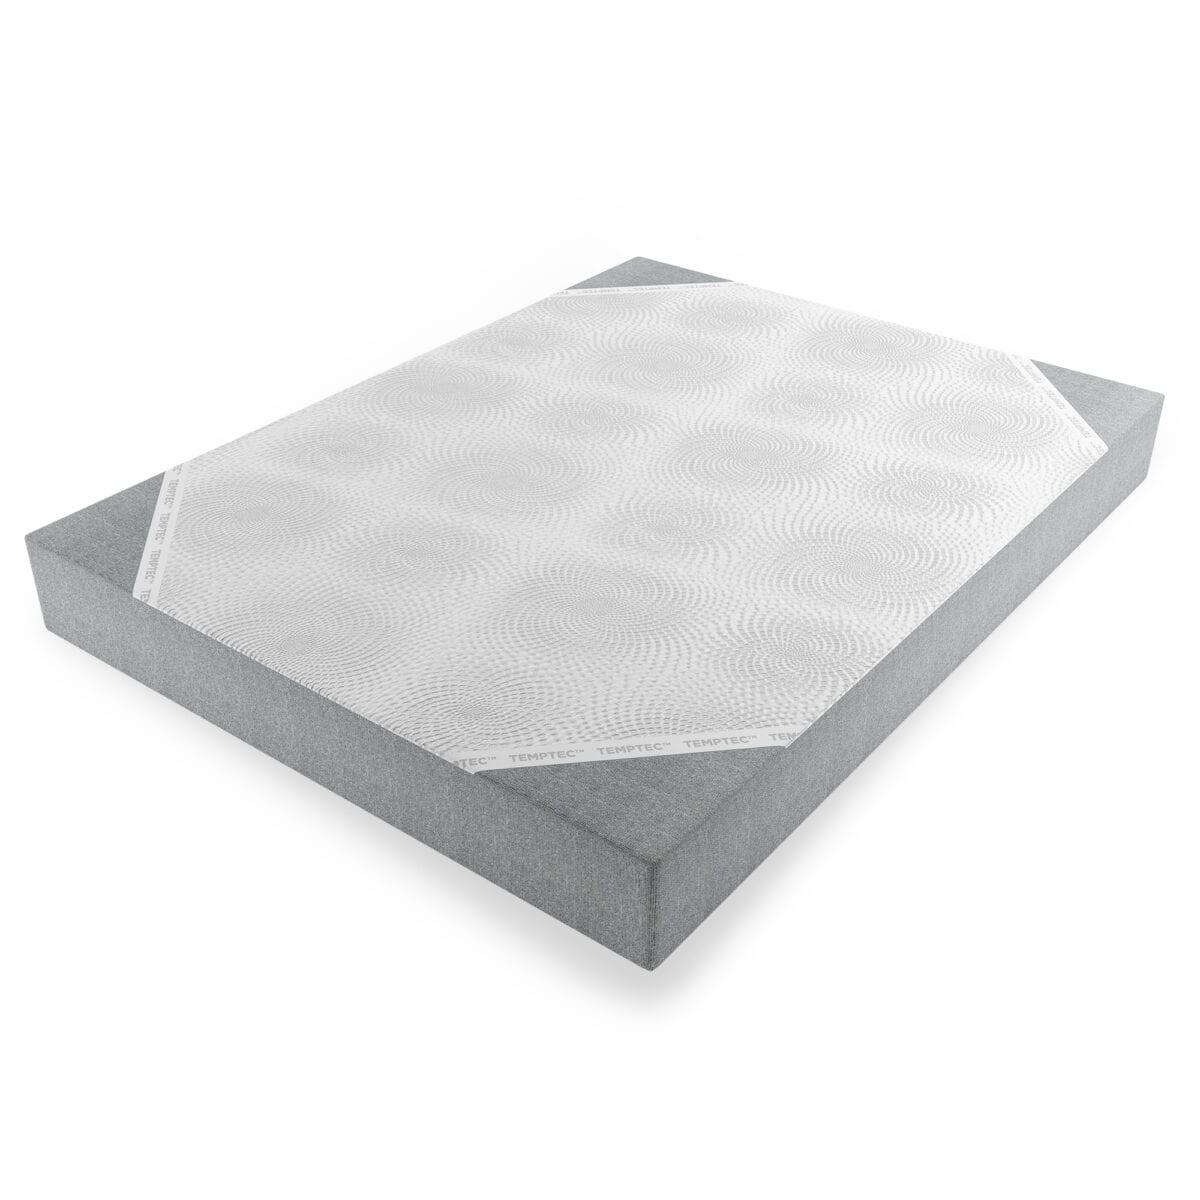 "Transform 10"" Memory Foam Mattress"